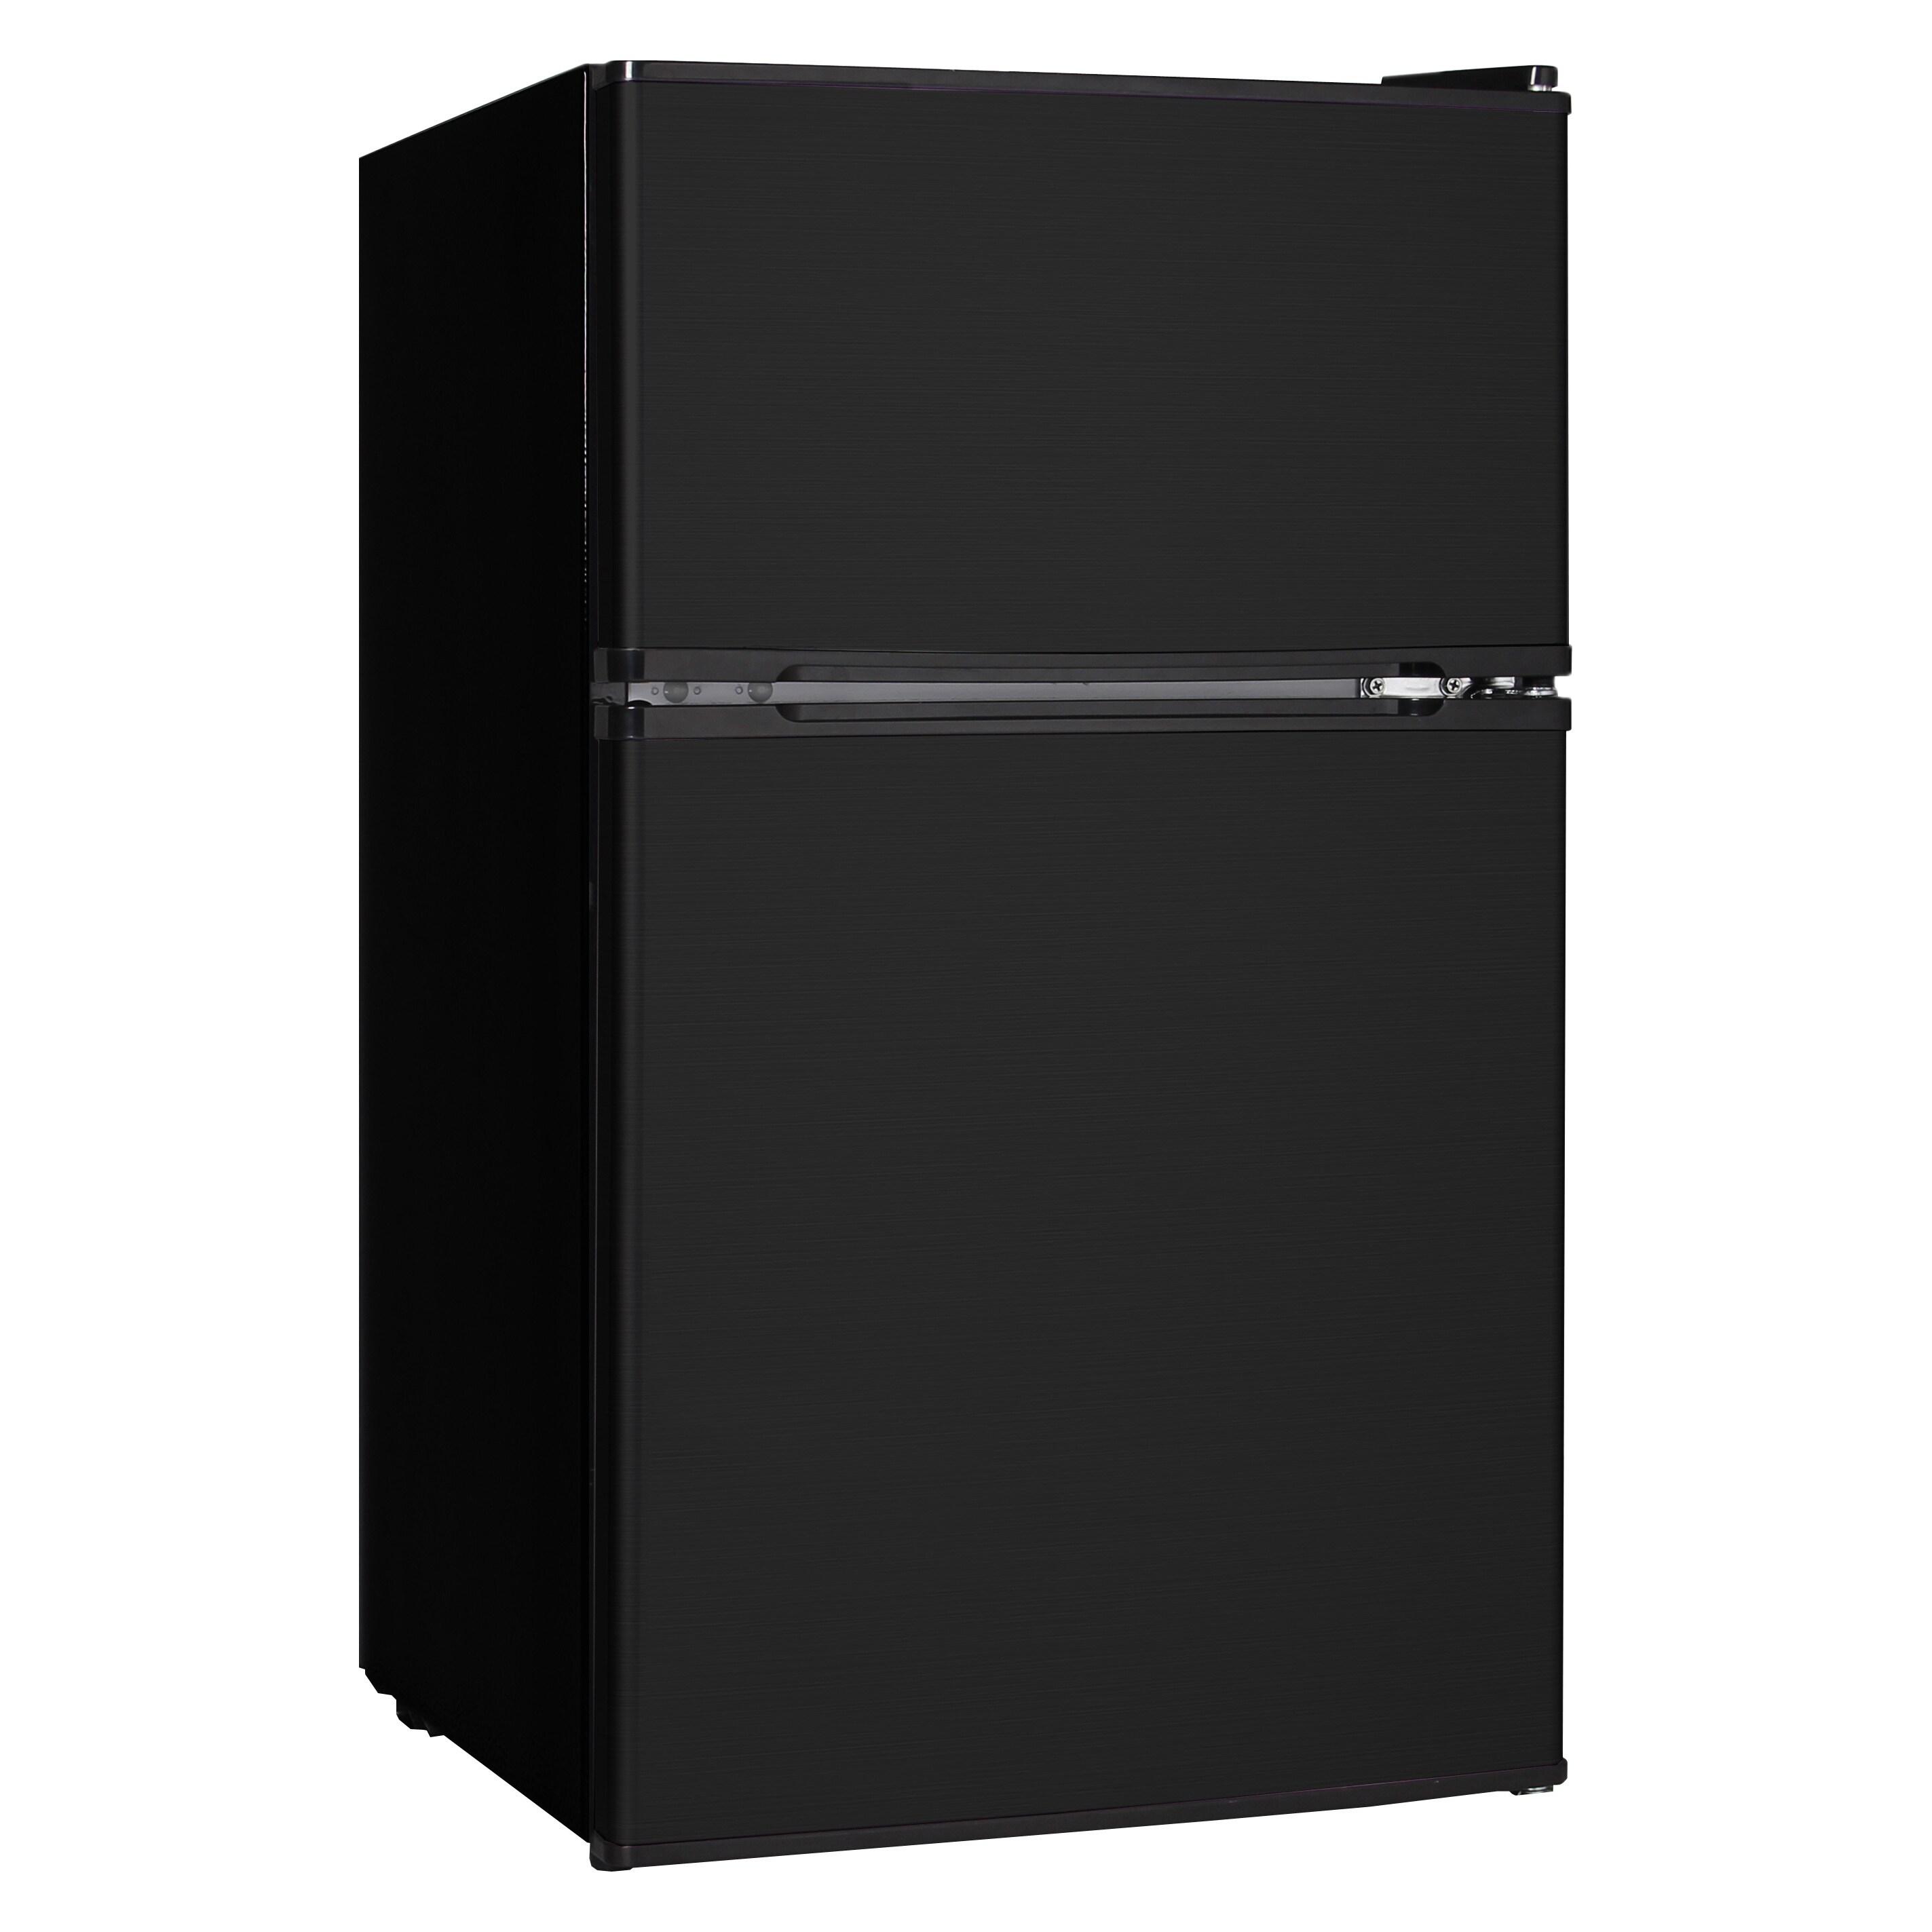 Midea 3.1 Cubic Feet Refrigerator Black (Metal)